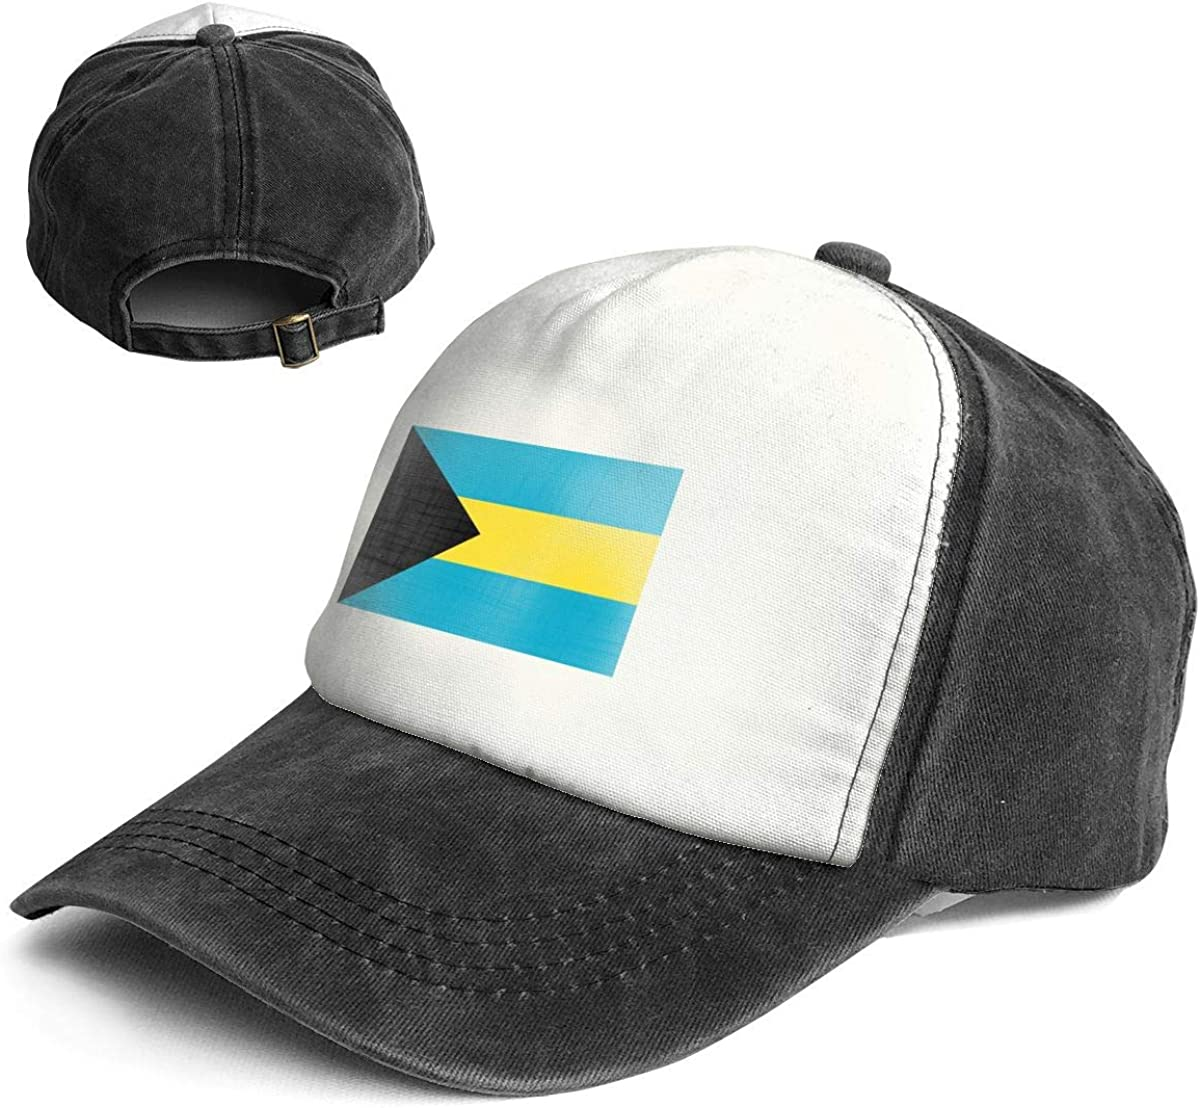 Fashion Vintage Hat Bahamas Flag Adjustable Dad Hat Baseball Cowboy Cap